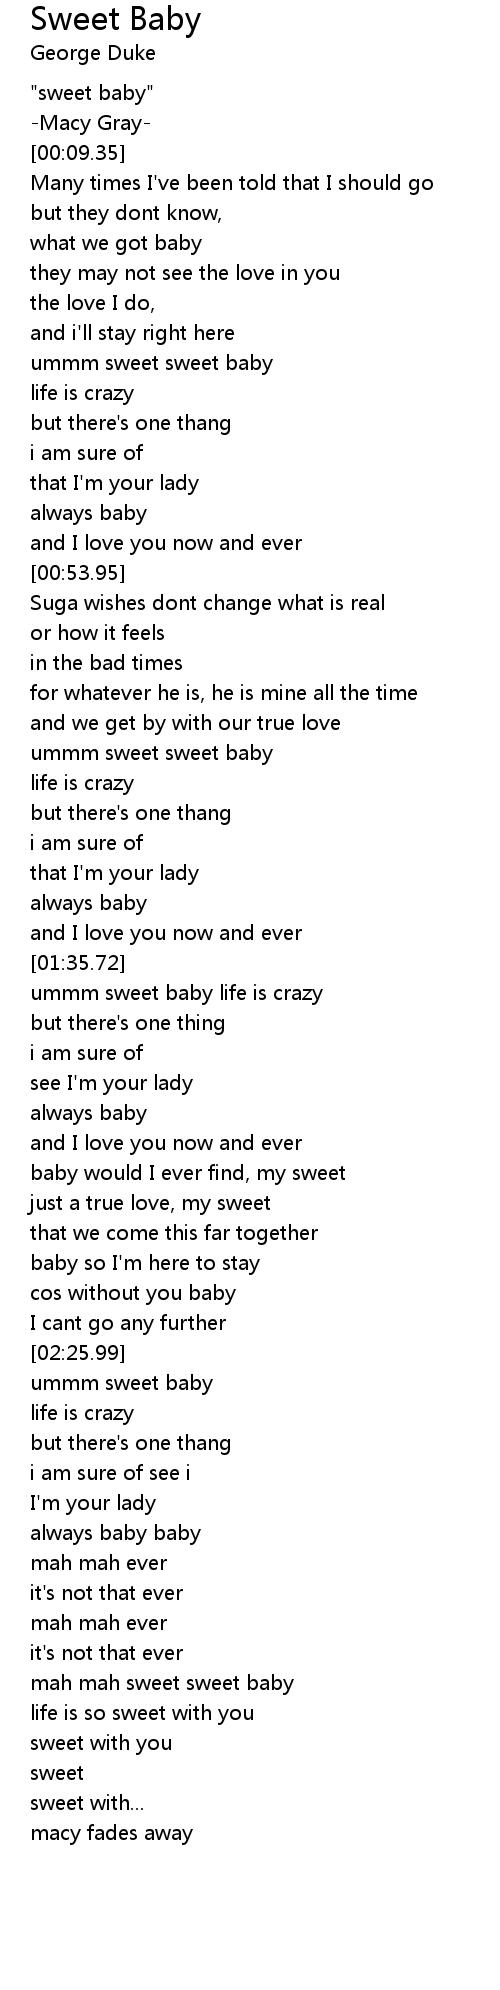 Sweet love 歌詞 so